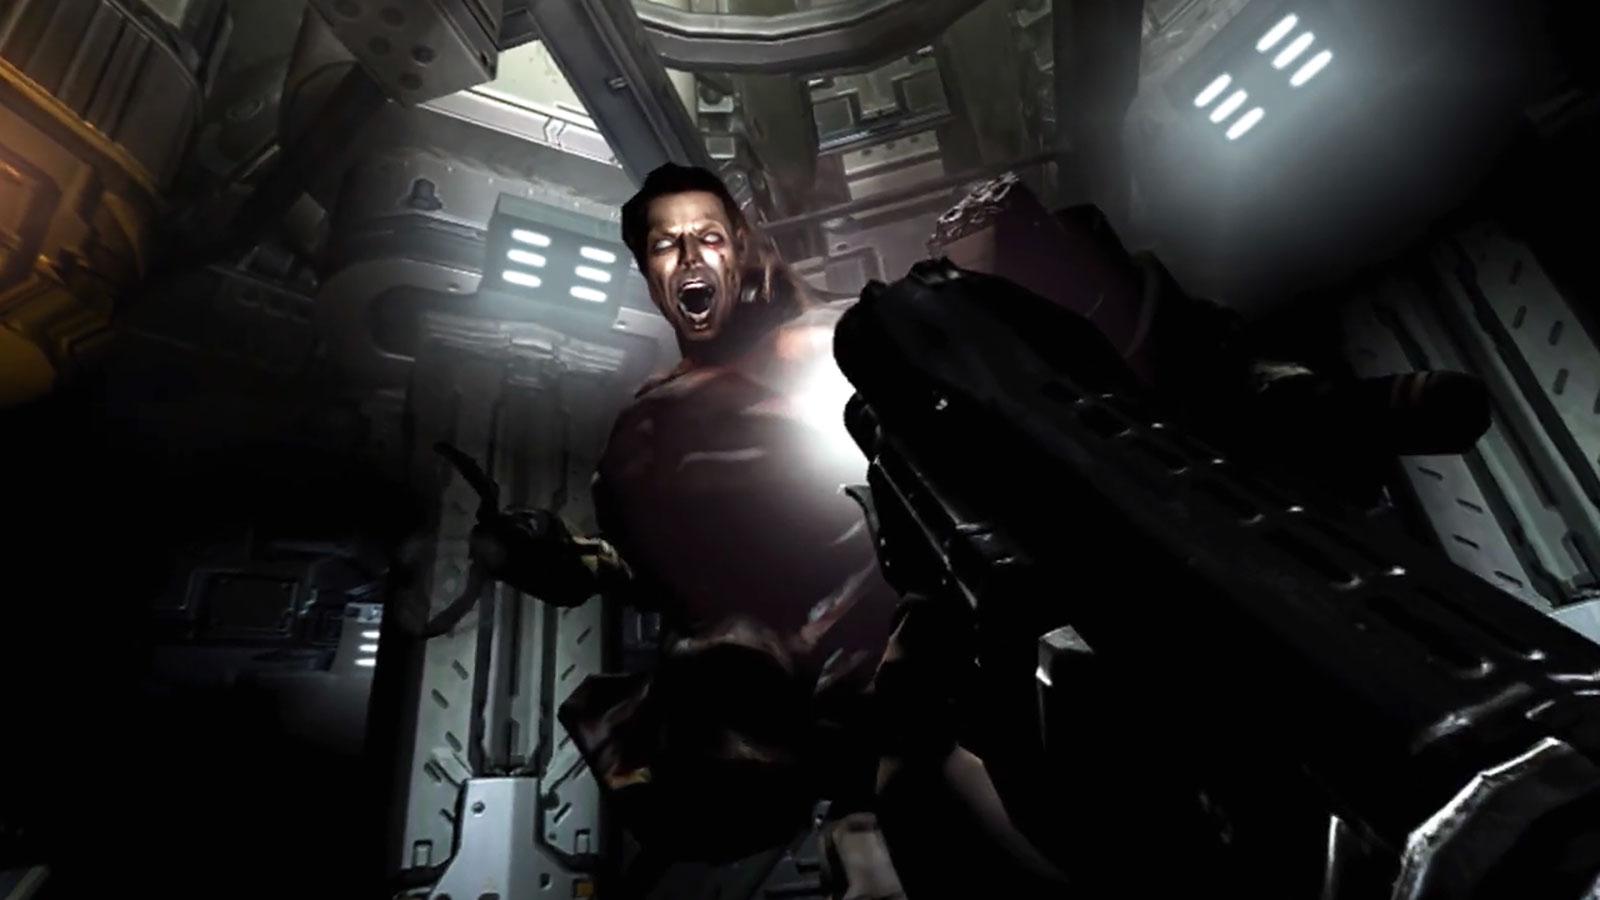 'Doom 3' gets a second life on PlayStation VR